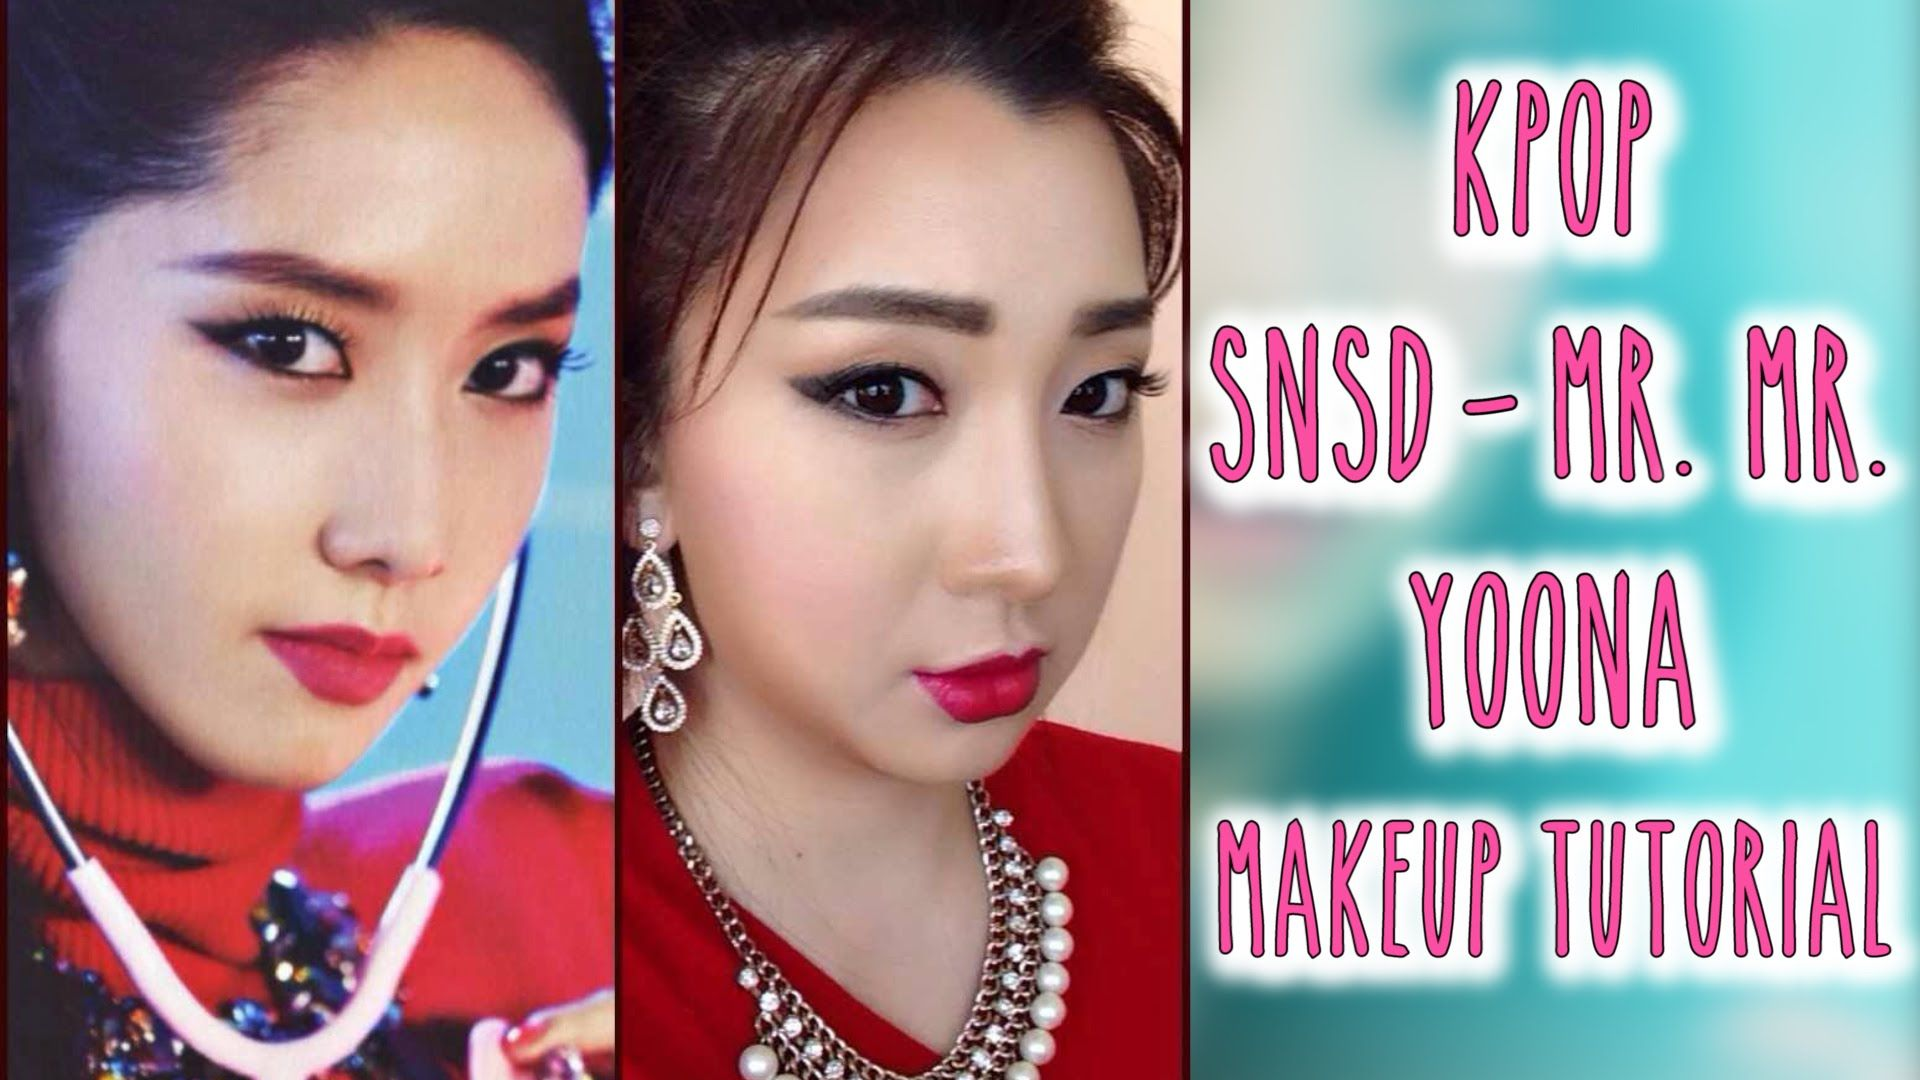 Girls Generation Snsd Mr Mr Yoona Kpop Makeup Tutorial Kpop Makeup Tutorial Makeup Tutorial Beauty Hacks Acne